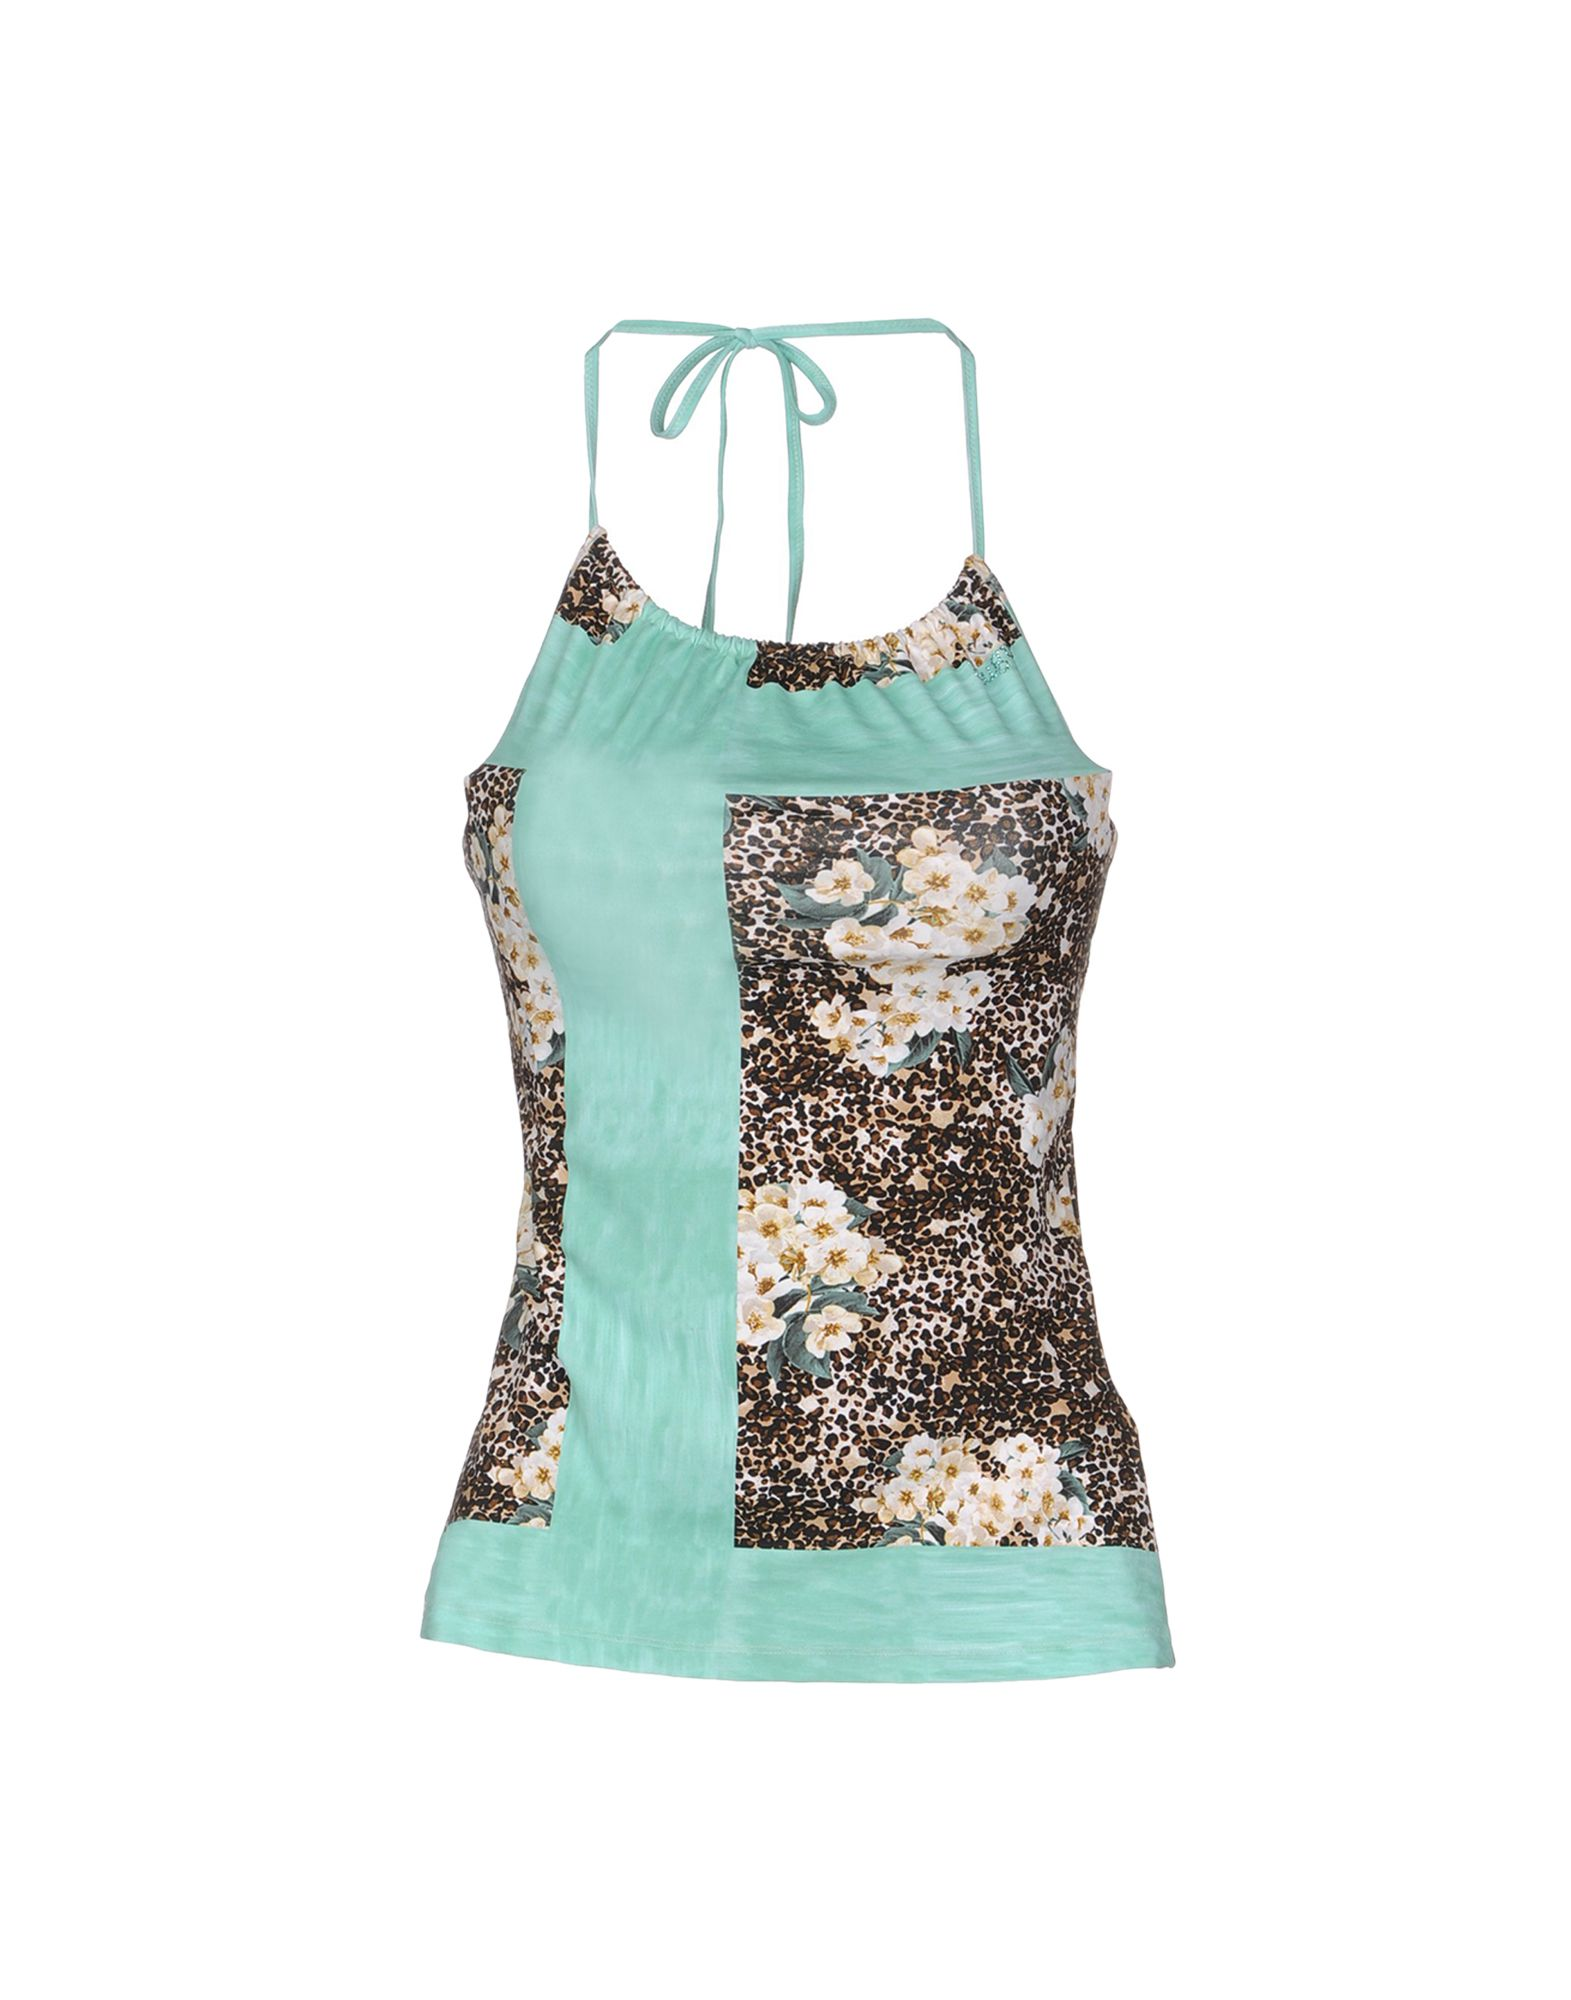 BLUGIRL BLUMARINE BEACHWEAR Топ без рукавов blugirl blumarine beachwear слитный купальник